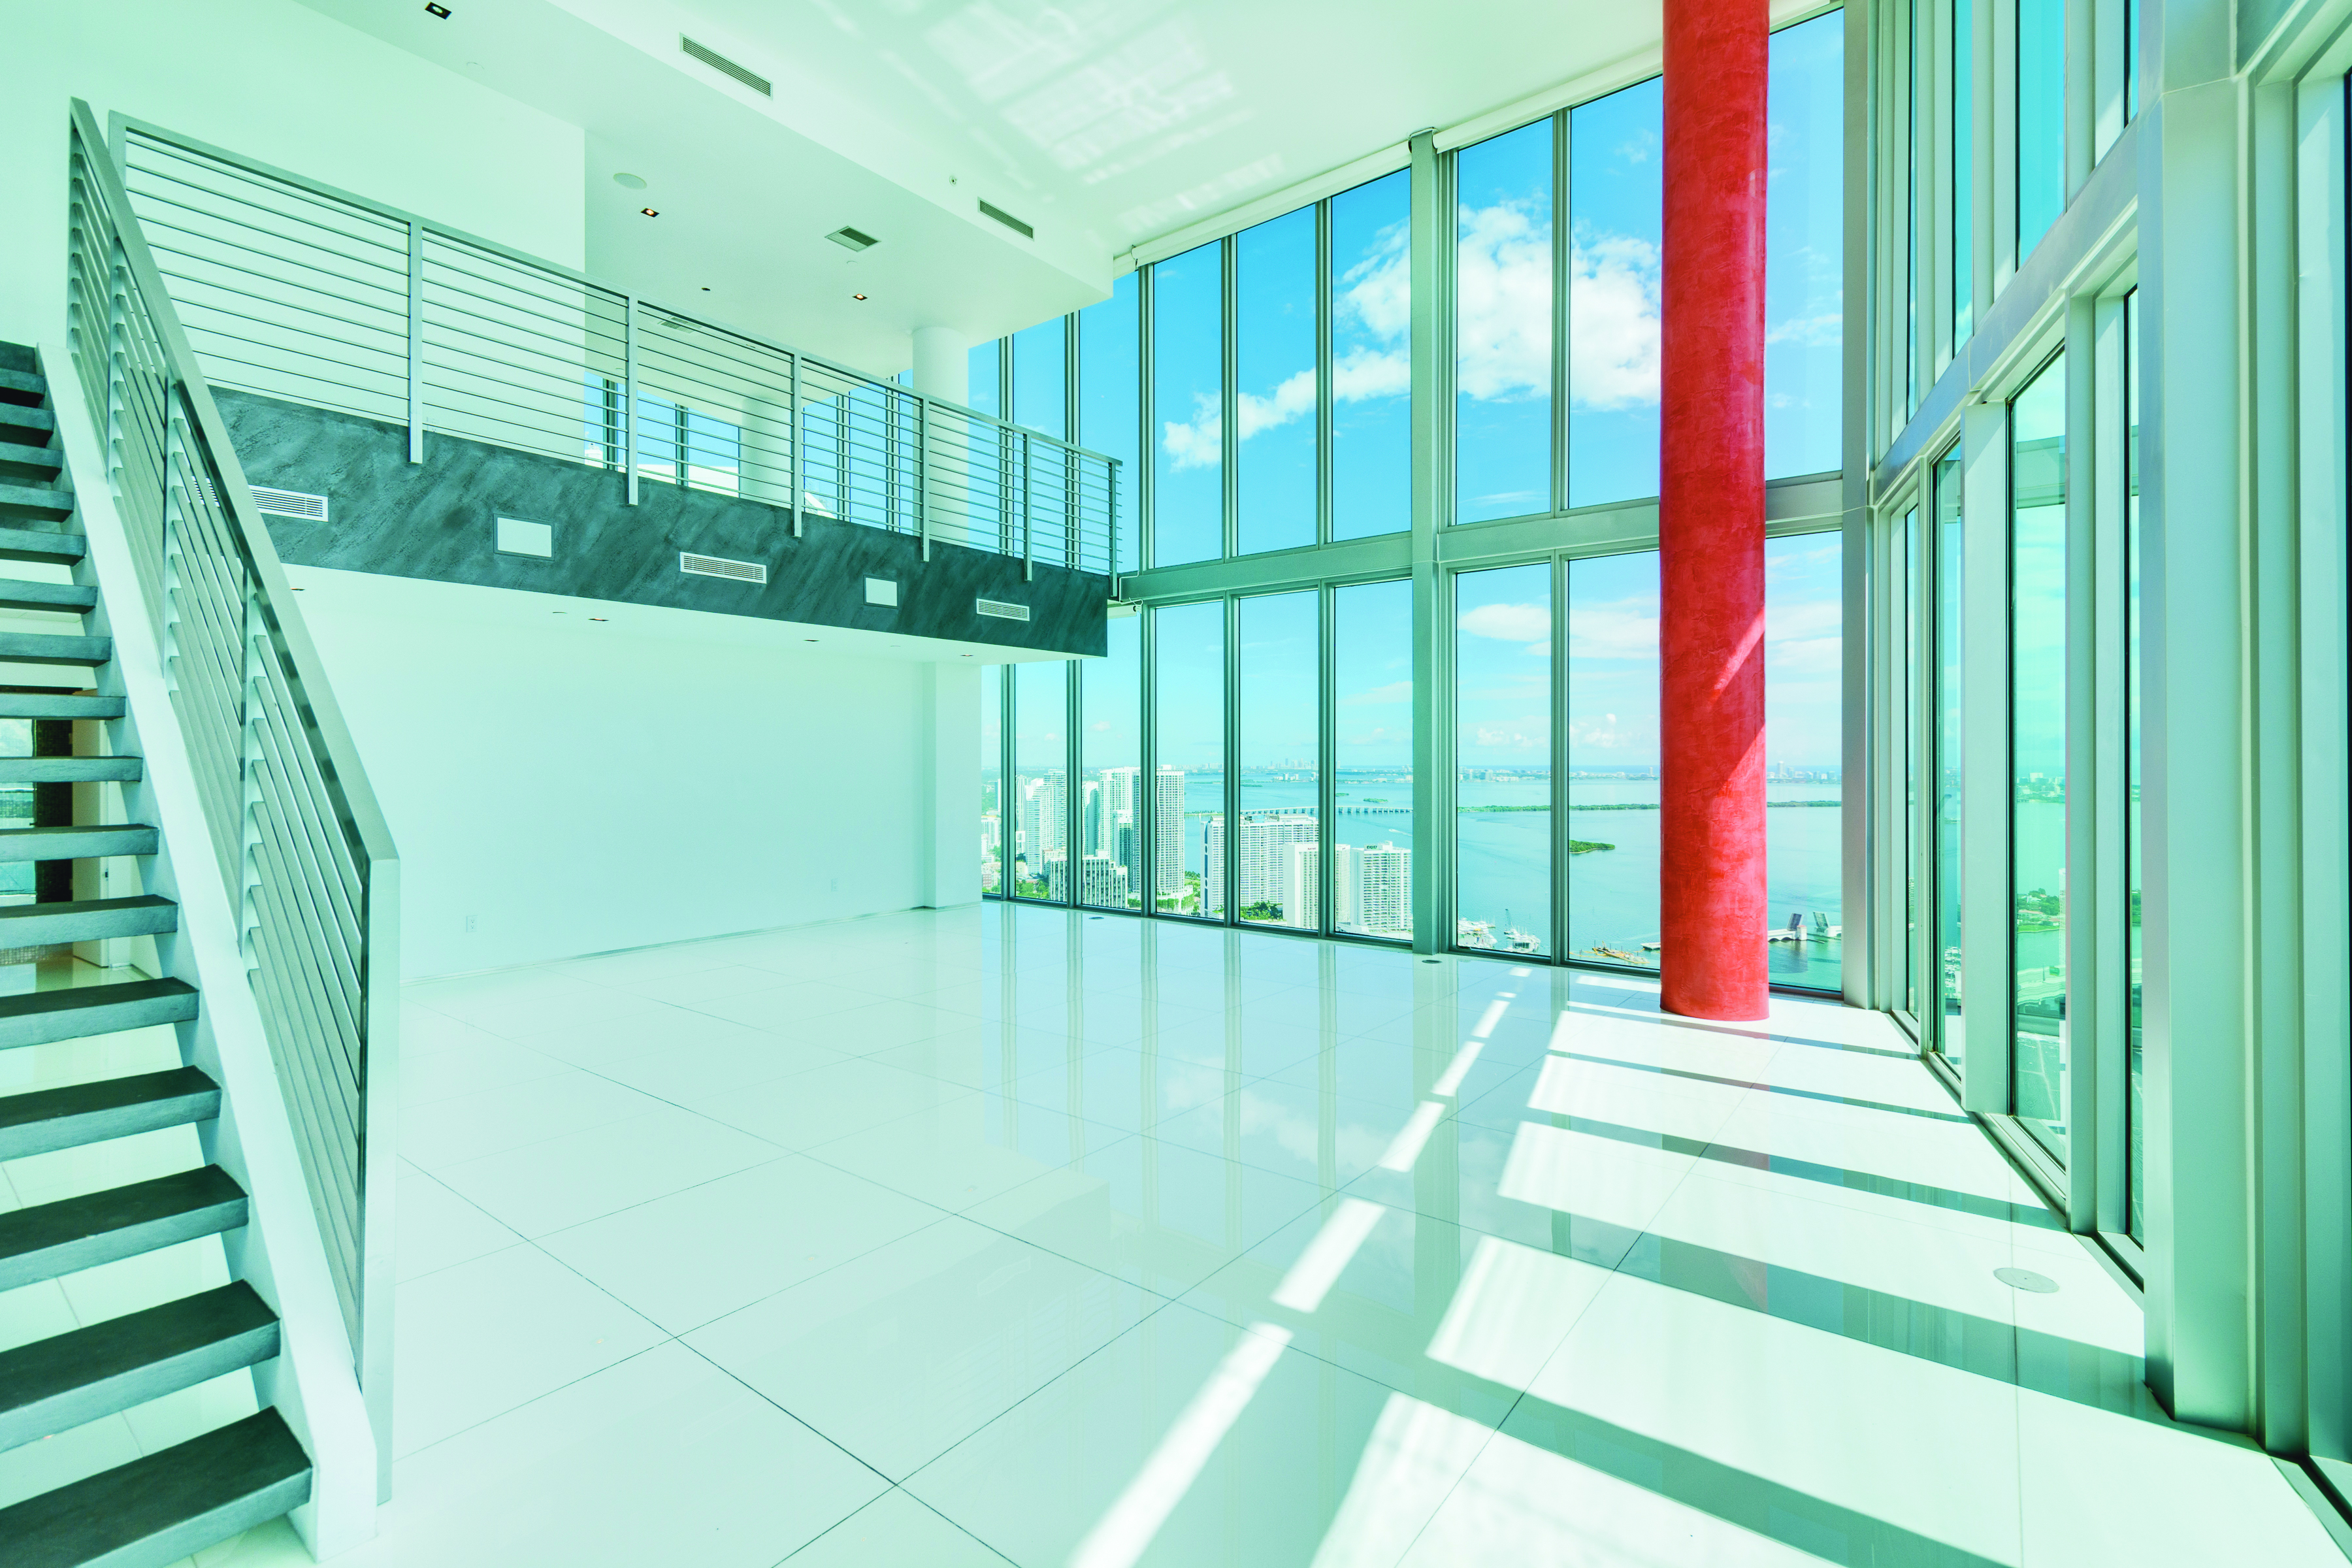 Condominium for Sale at 888 Biscayne Blvd #5708 888 Biscayne Bl 5708 Miami, Florida, 33132 United States